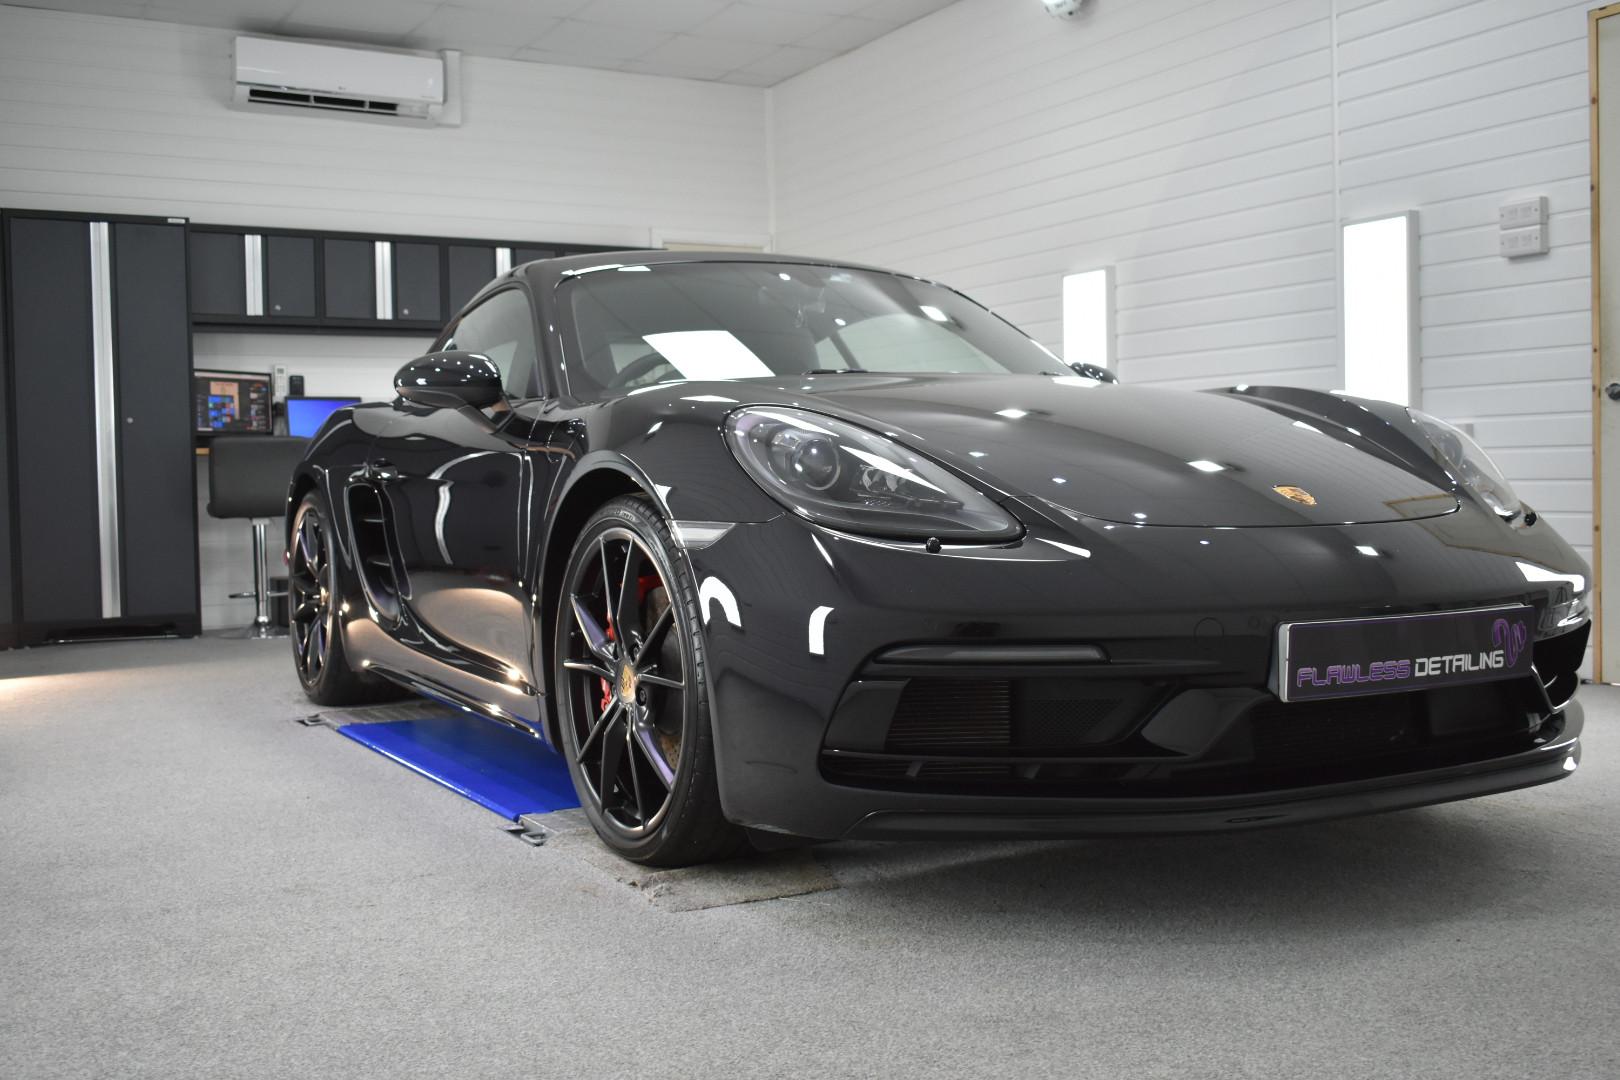 Porsche Cayman GTS & PPF - Detailing Cov